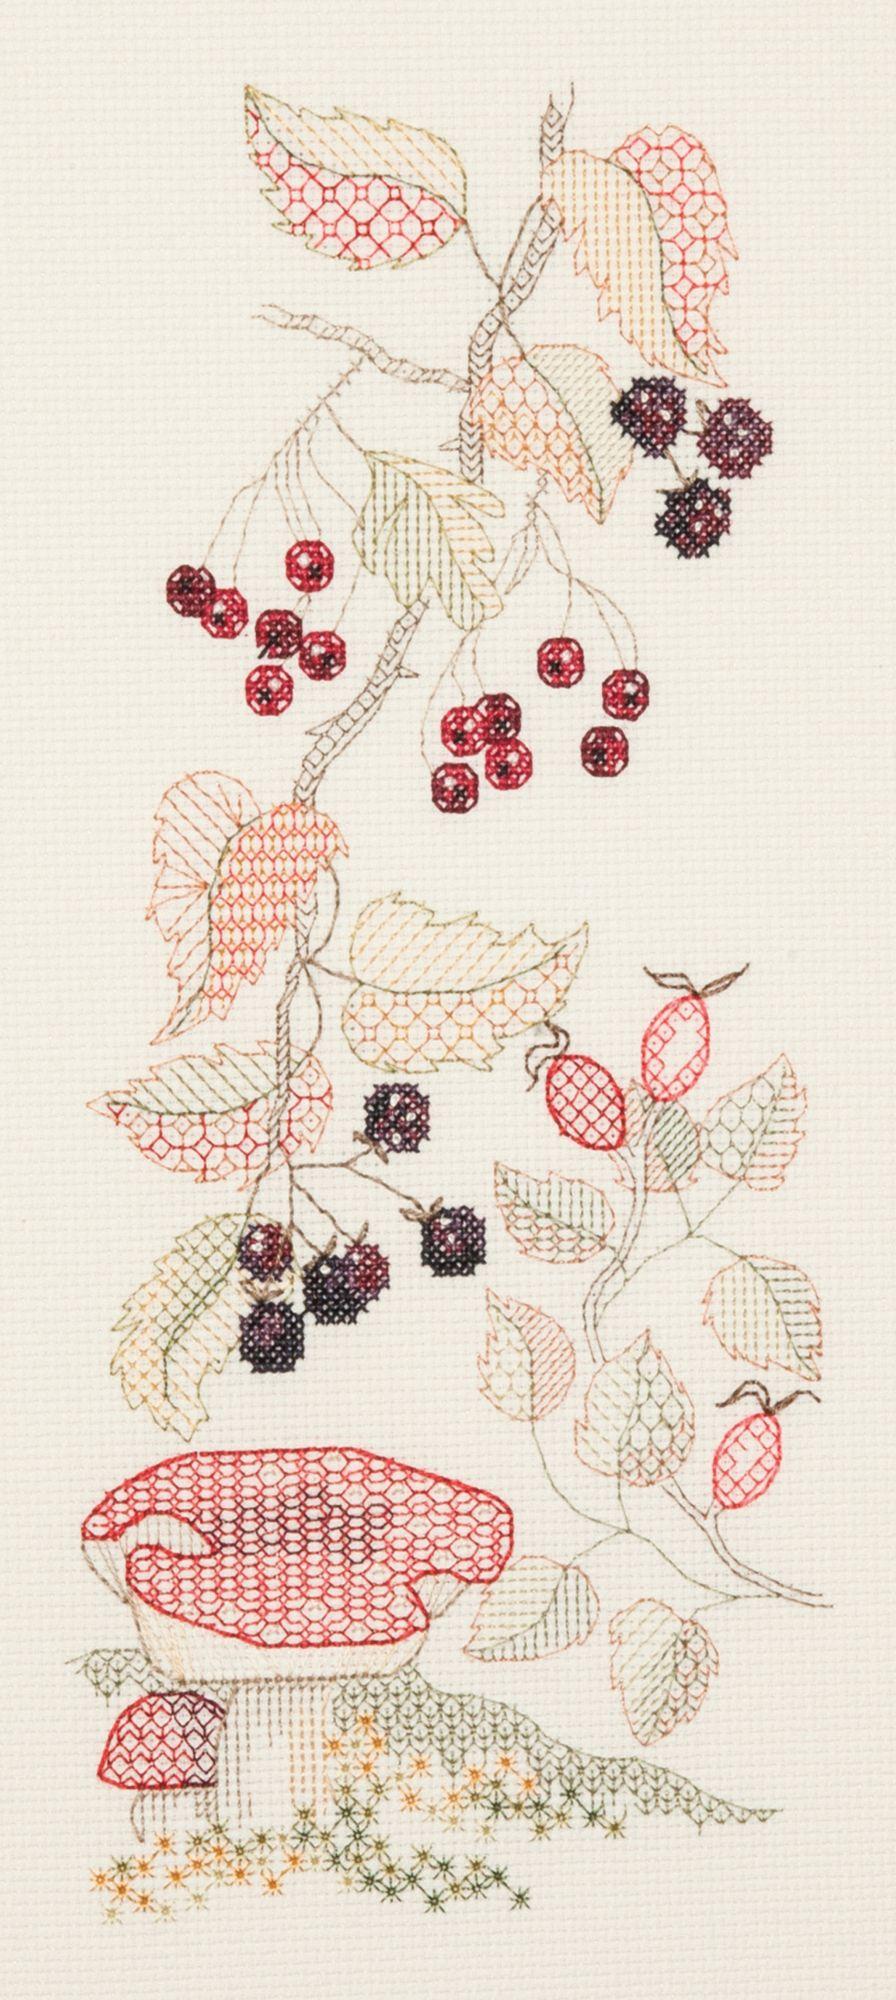 Derwent  SP03 embroidery Panels range - SP03